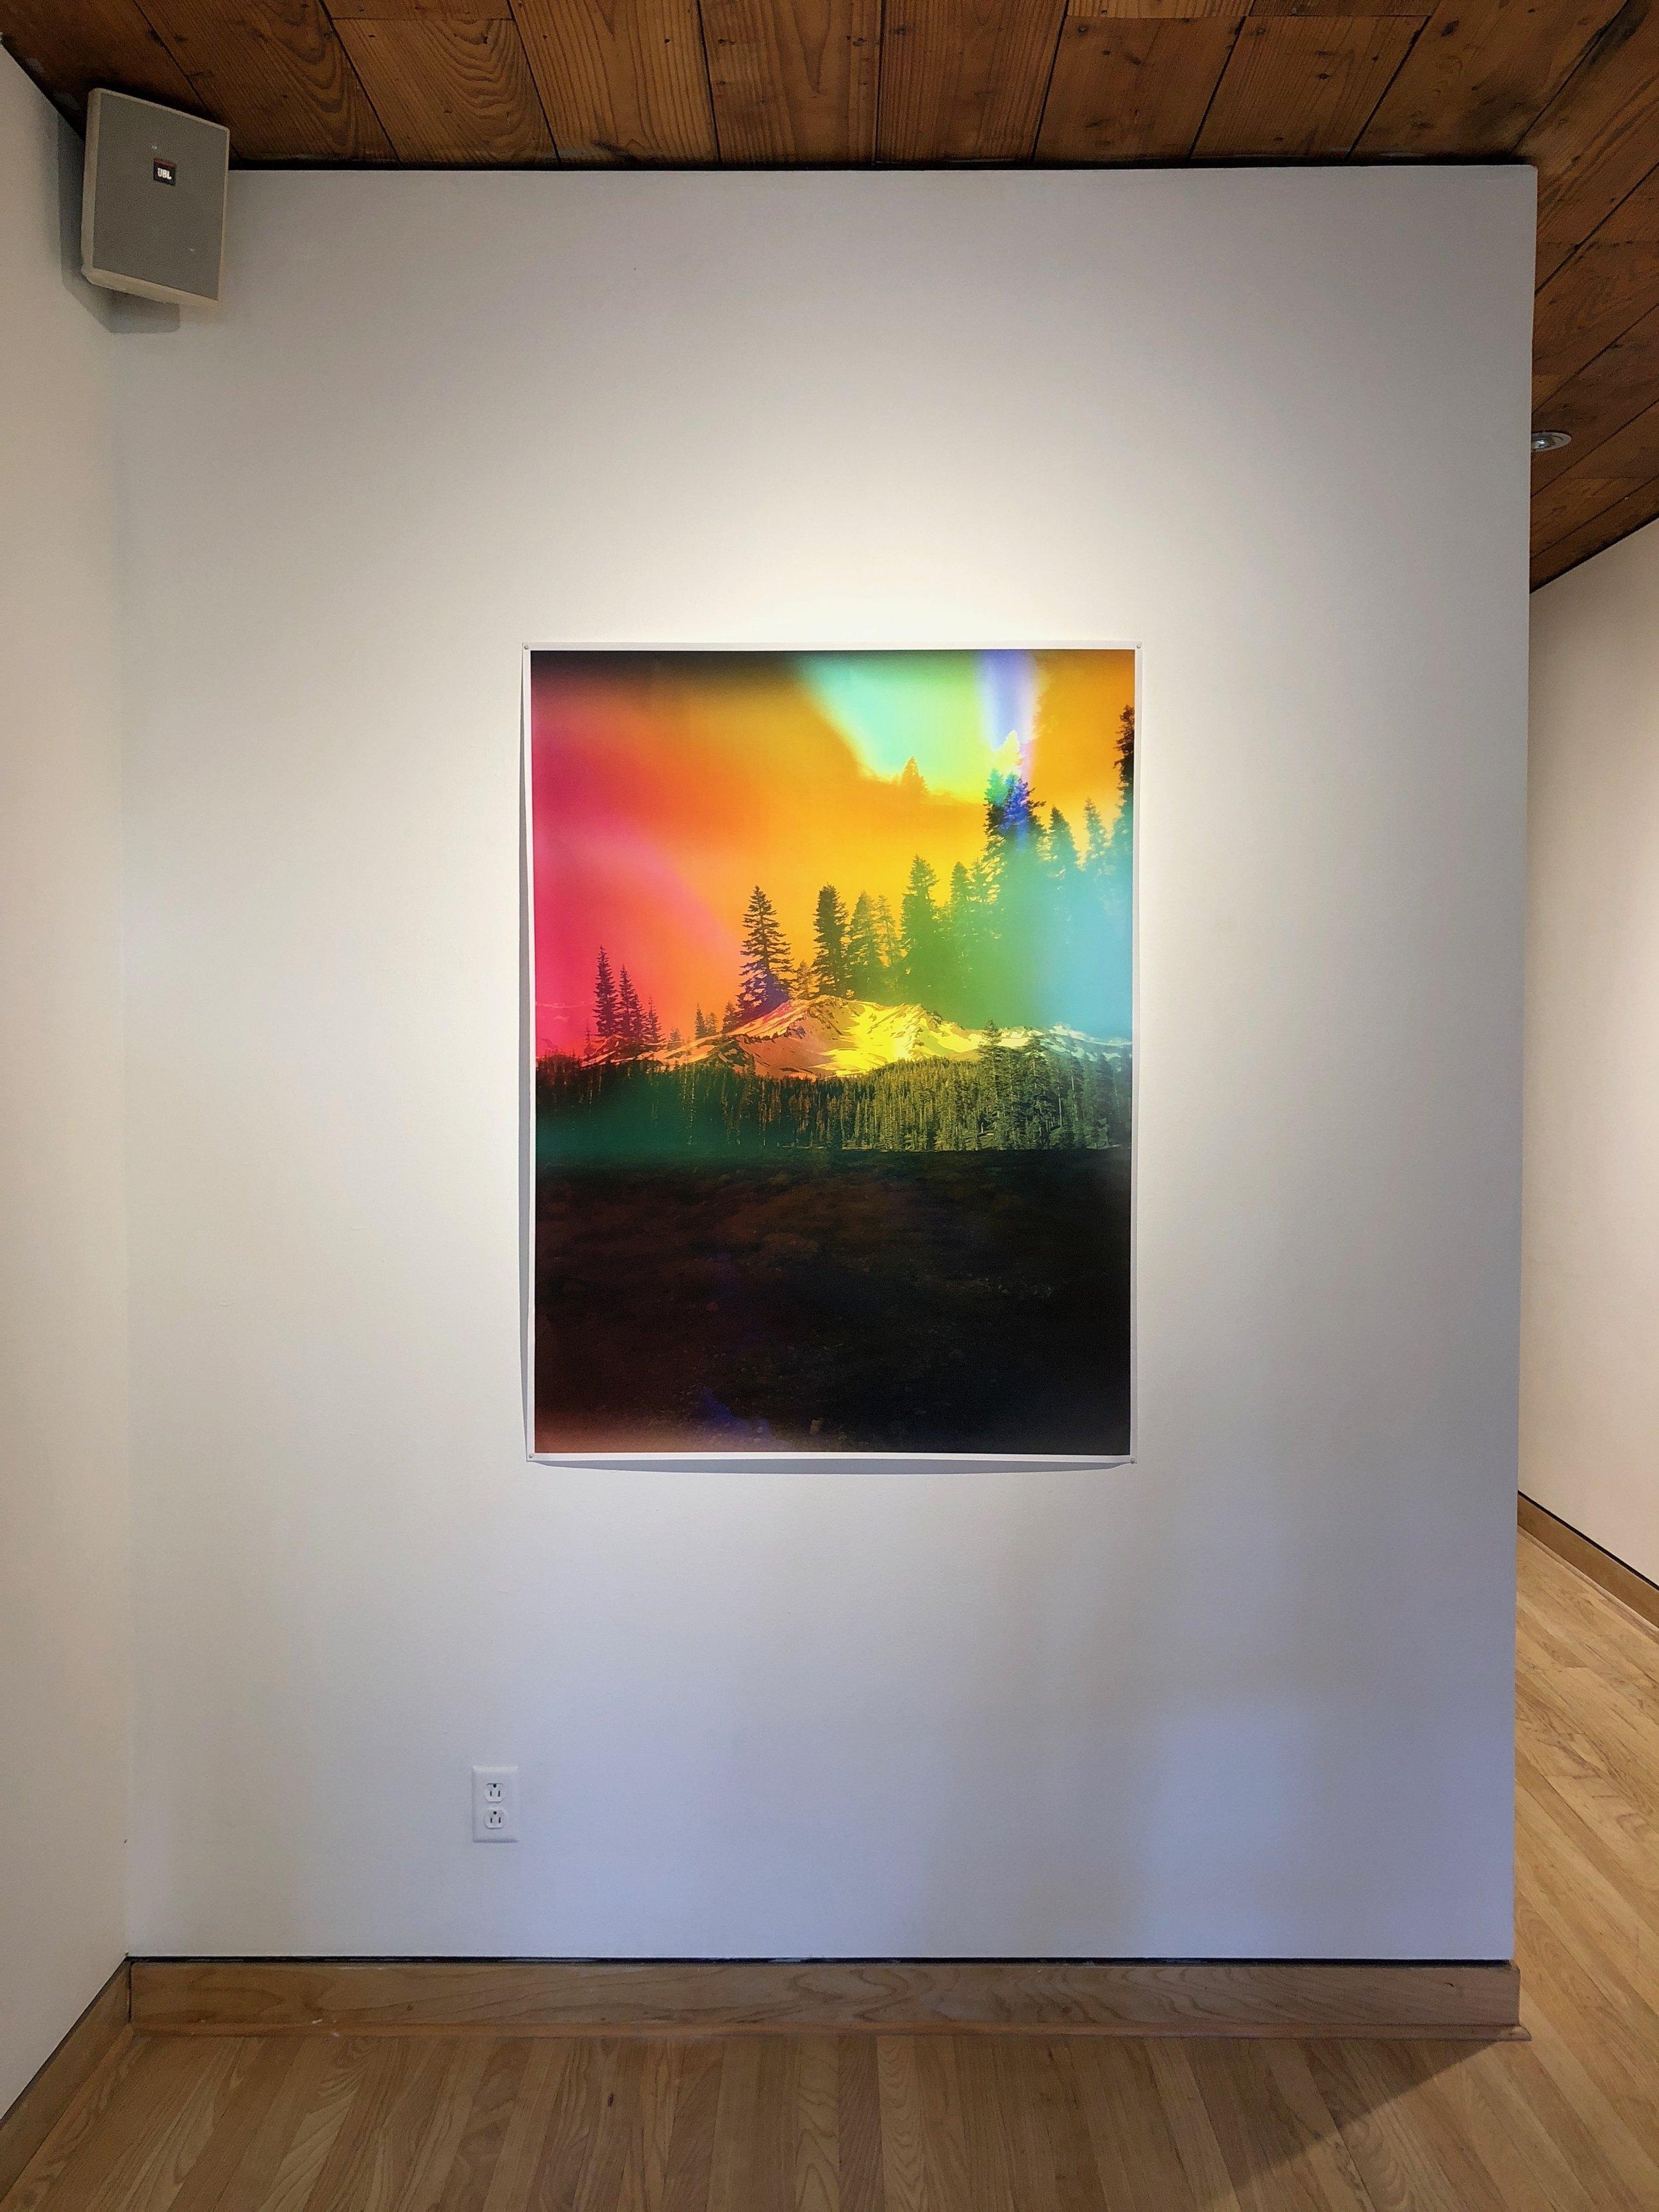 Installation view of Multiple Realities / Particular Truth, Flatland Gallery, Houston TX.  Mount Shasta Aura , Industrial inkjet print on newsprint, 48 x 36 in, 2017.